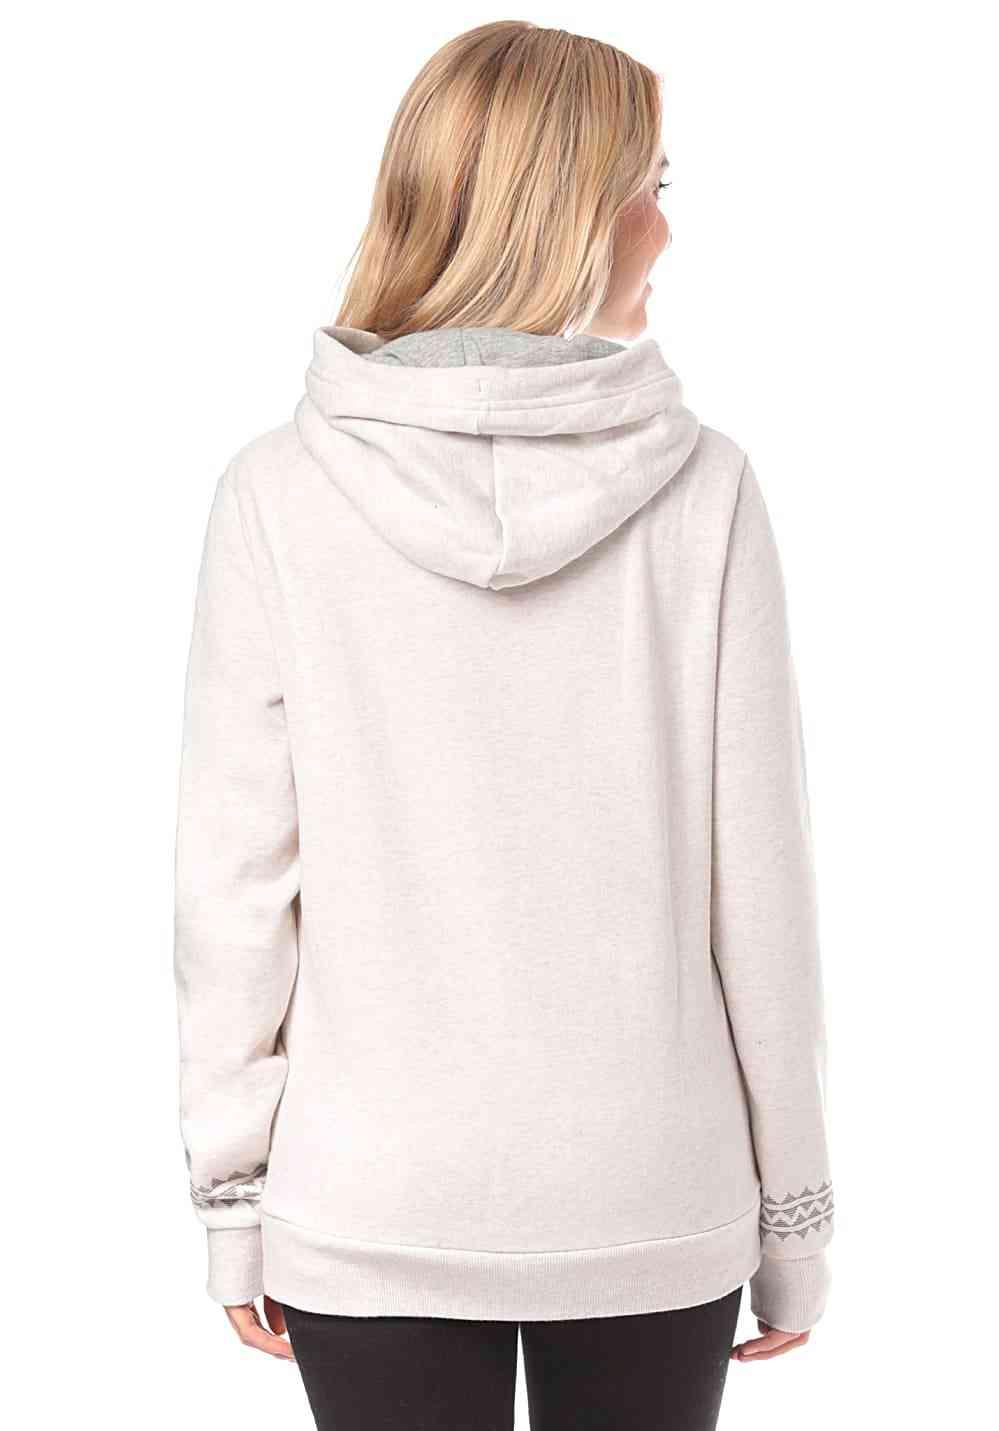 Hooded Fleece With Cross Over Collar, Extra Warmth Sweatshirt